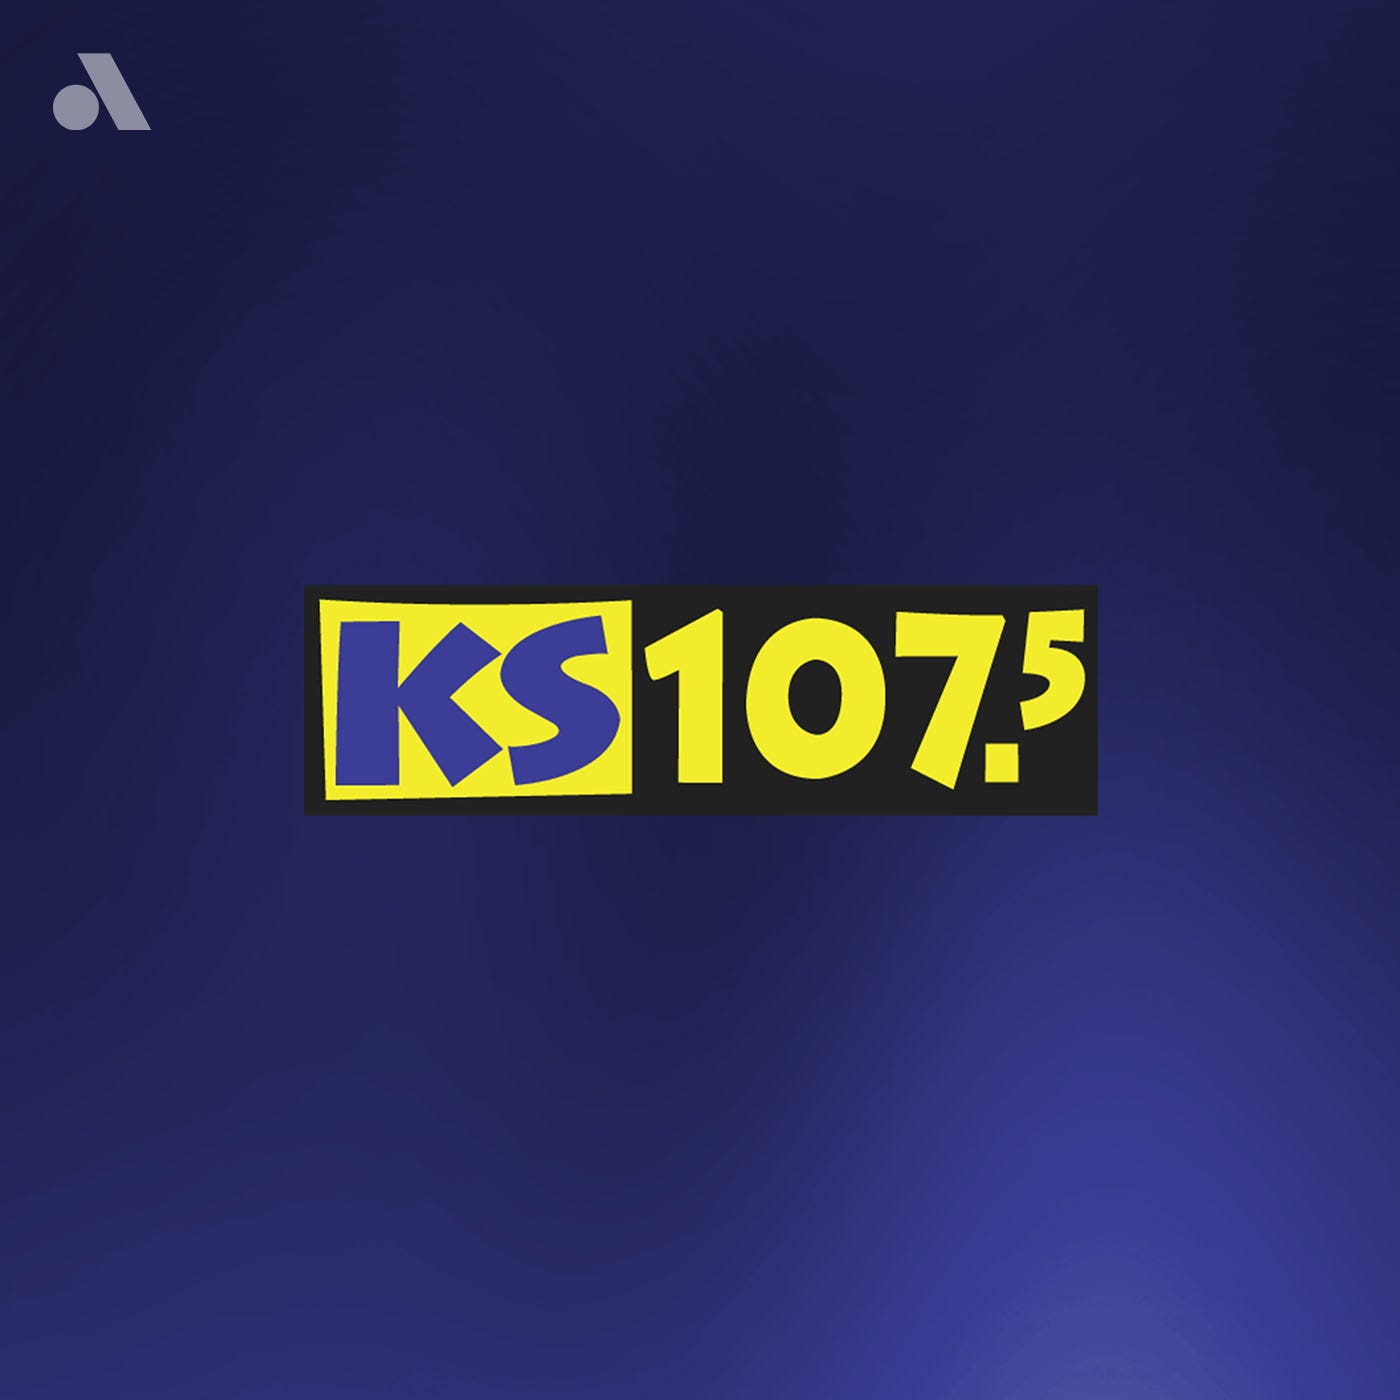 KS107.5